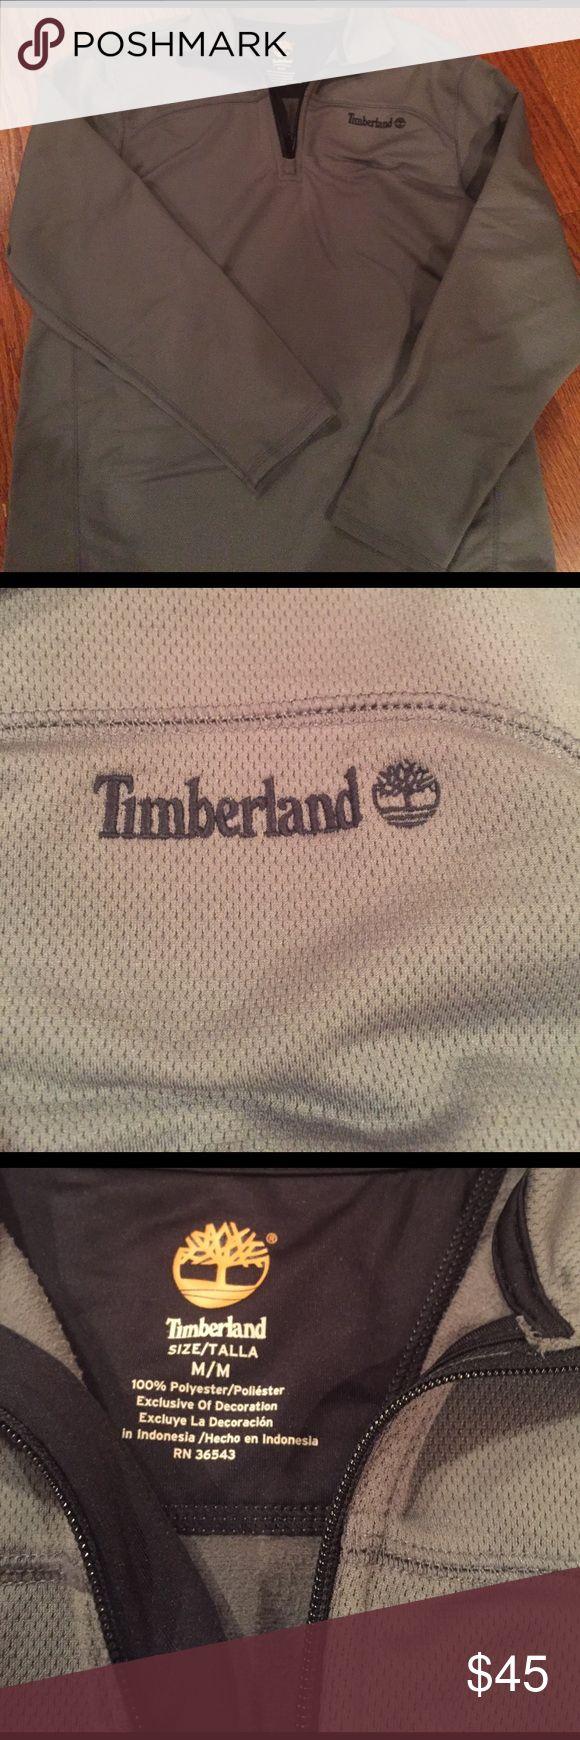 NWOT MENS TIMBERLAND HALF ZIP NWOT HEAVYWEIGHT MENS GRAY TIMBERLAND HALF ZIP Timberland Shirts Sweatshirts & Hoodies